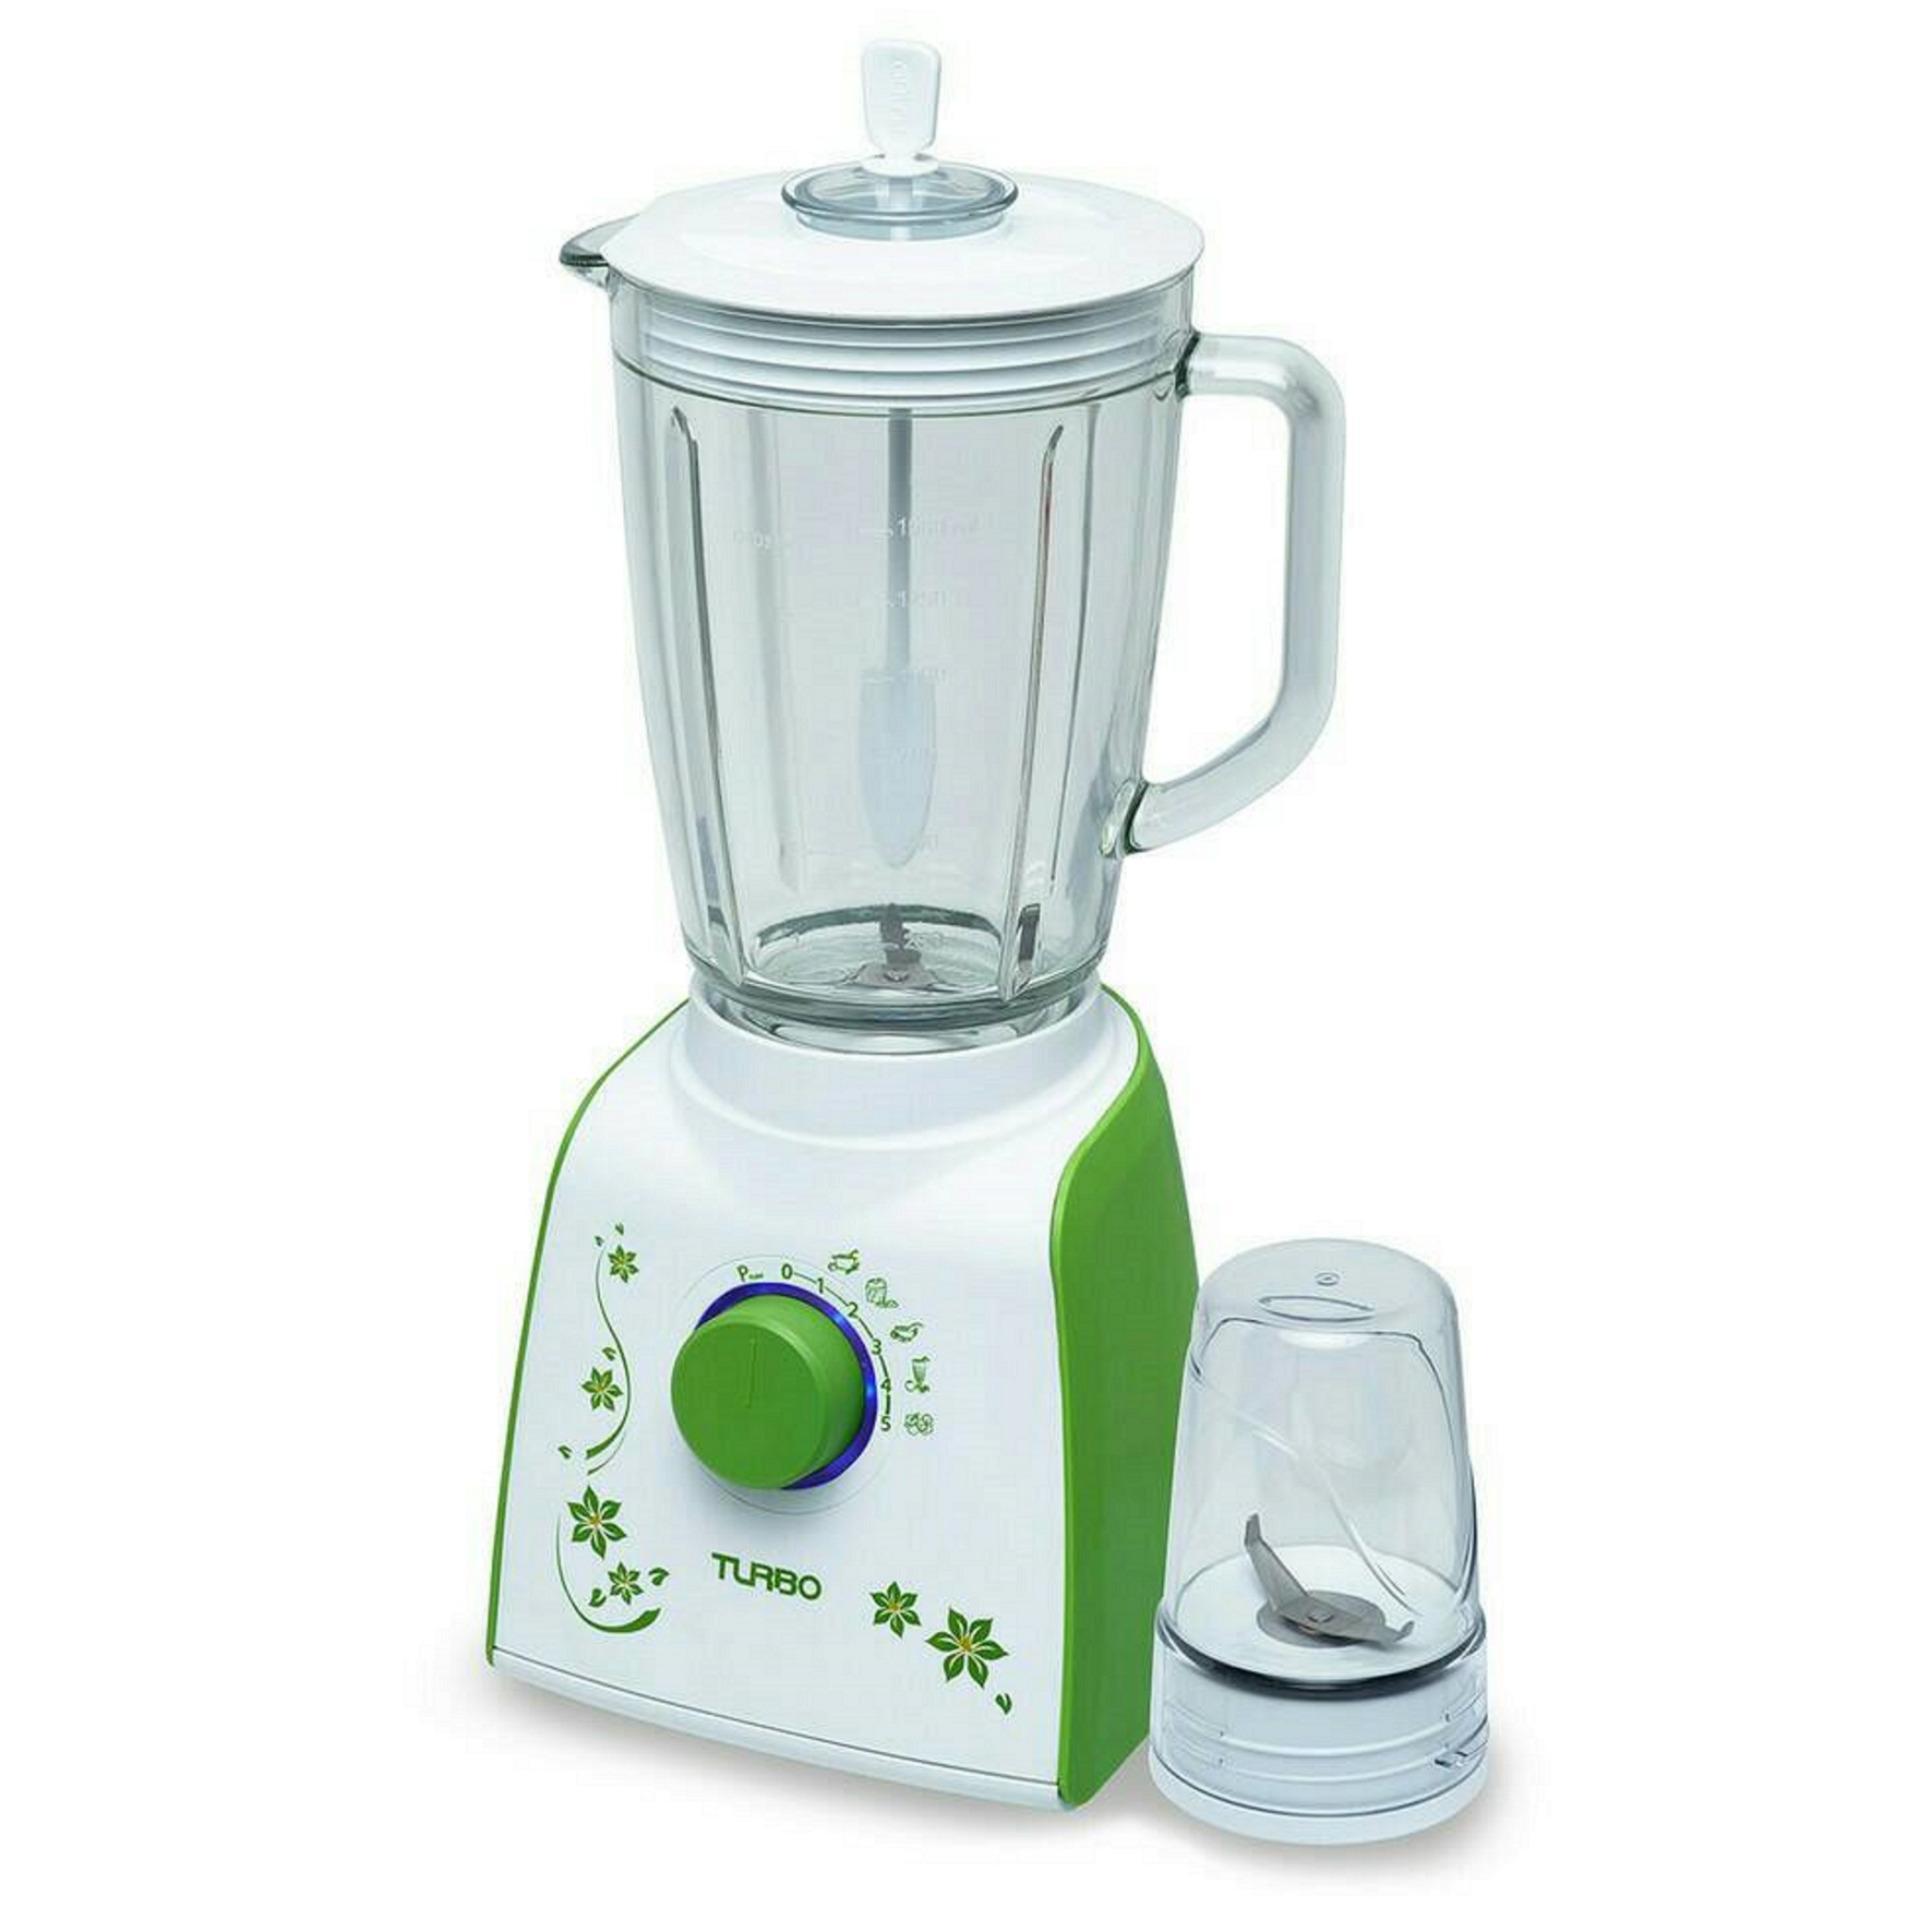 Hot Deals Turbo Blender Gelas Kaca Drymill Ehm 8098 Hijau